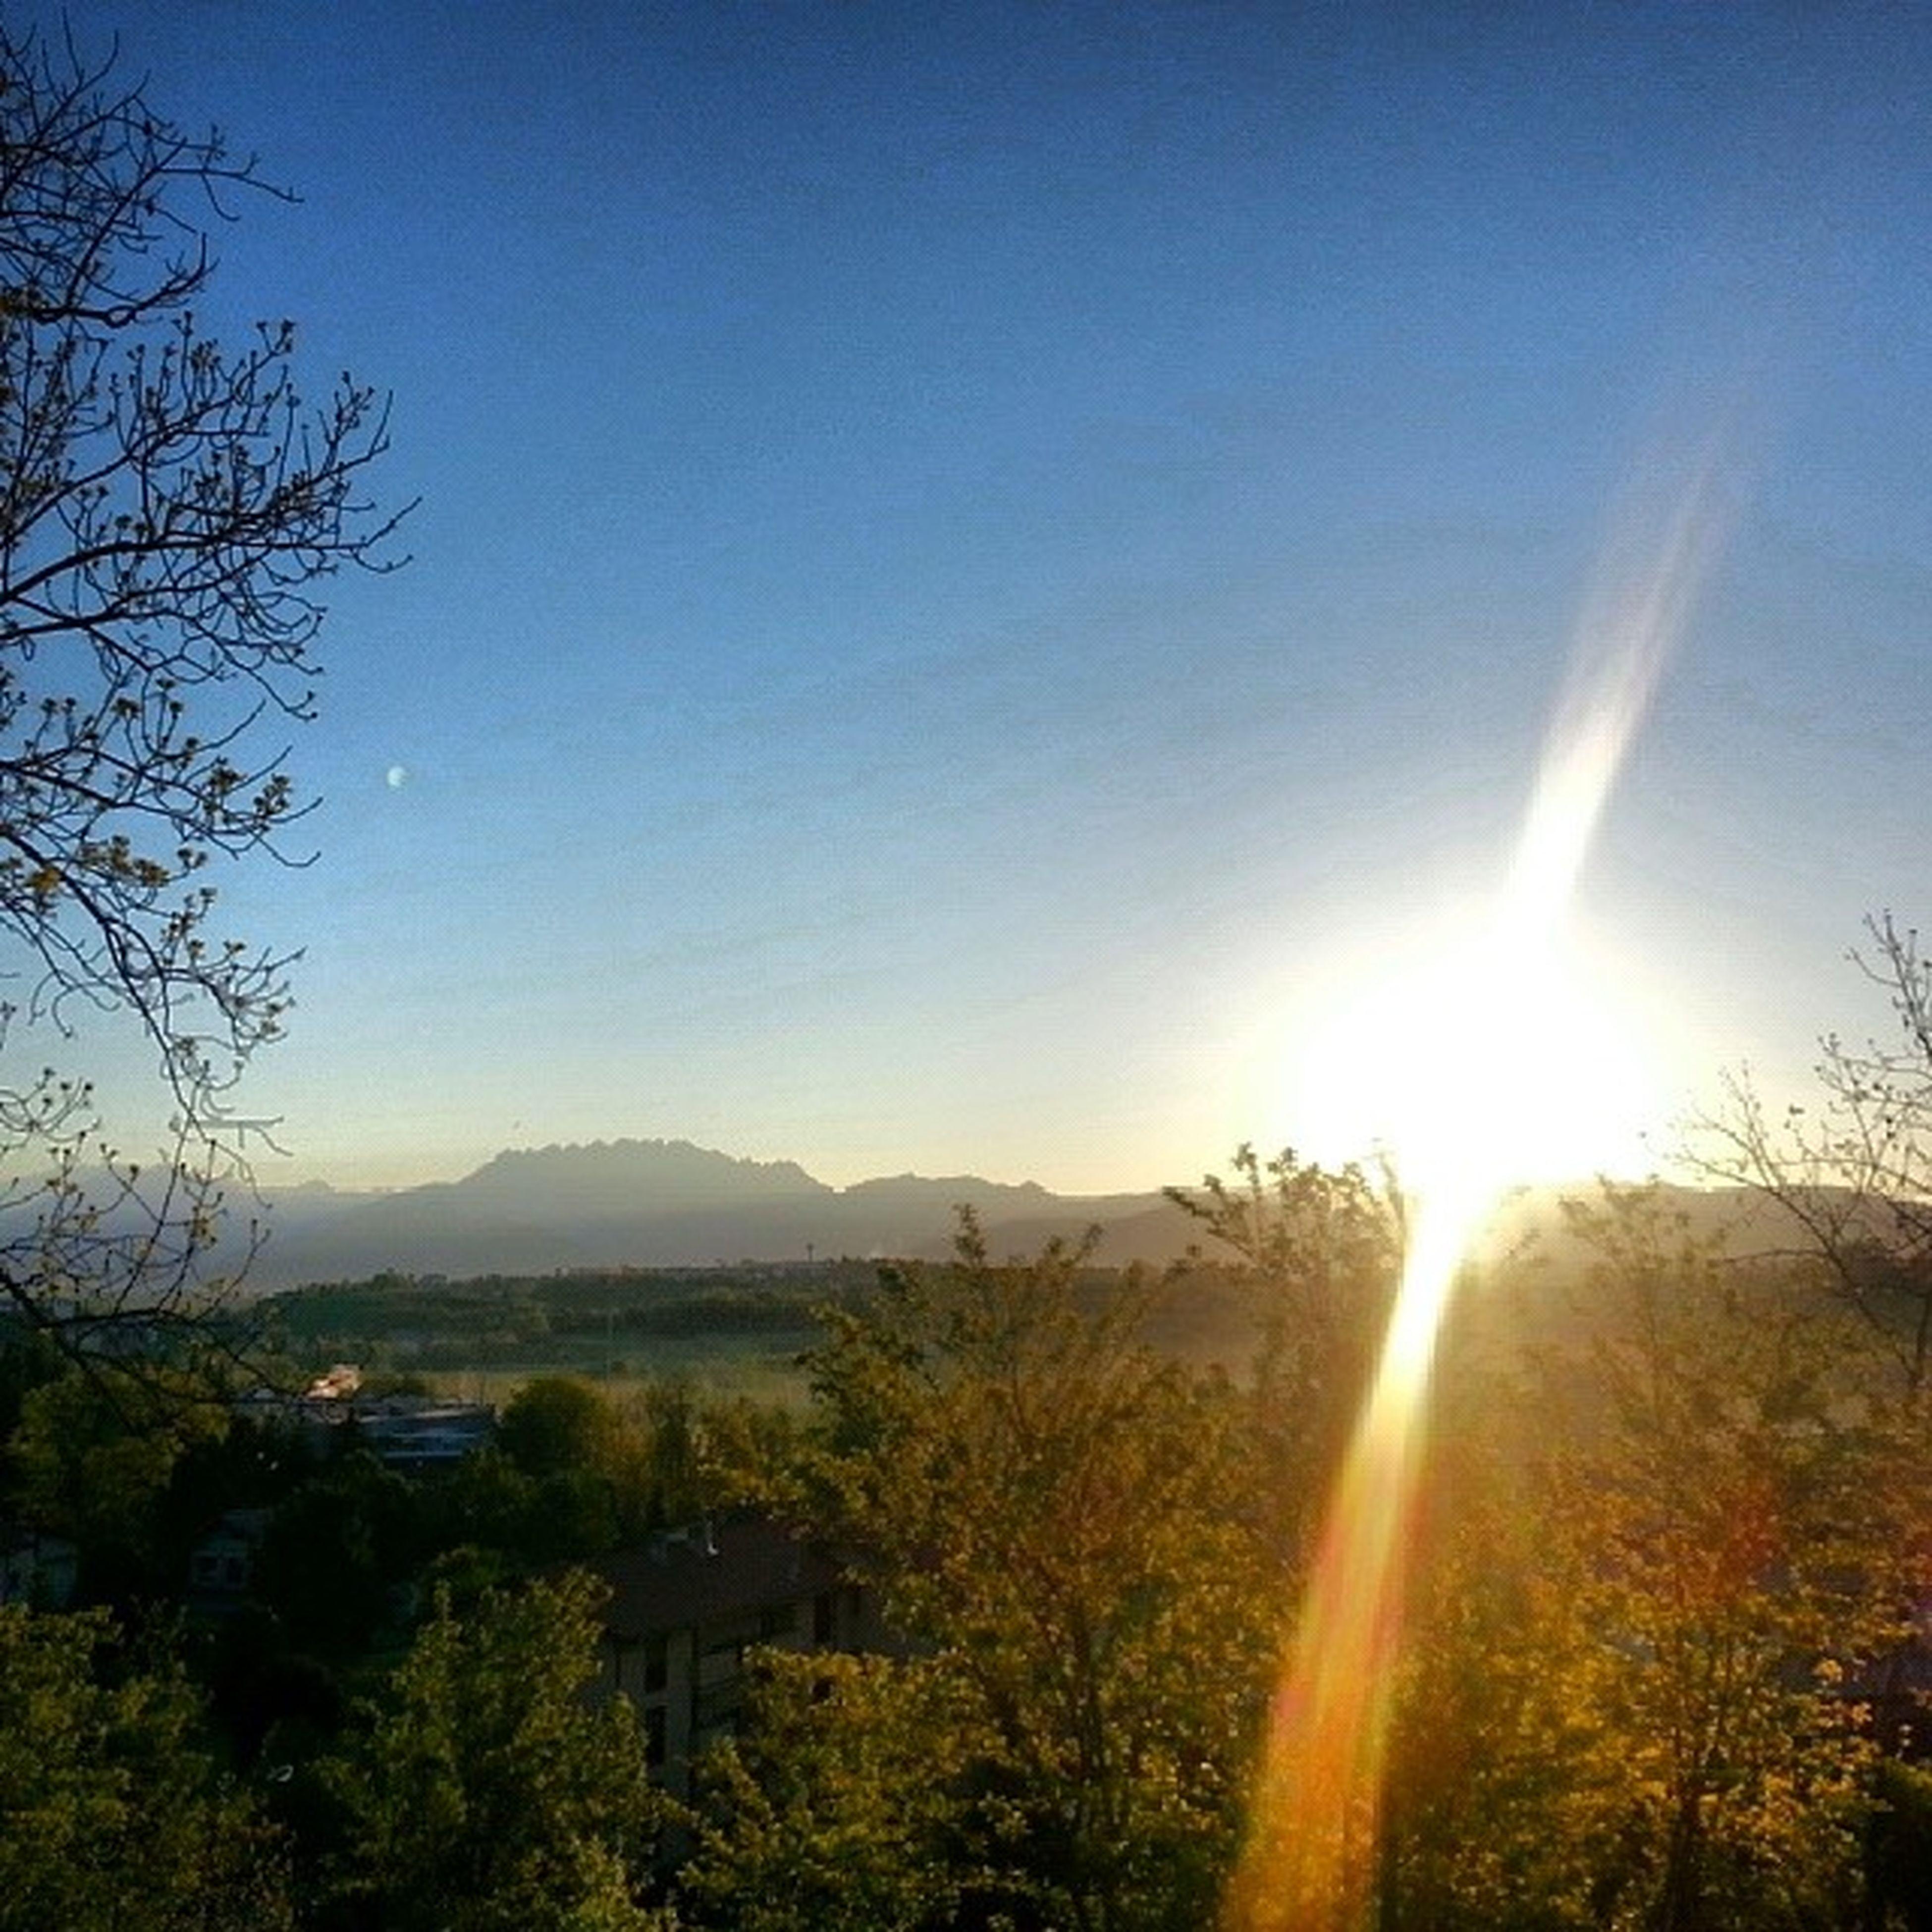 sun, sunbeam, tree, sunlight, lens flare, mountain, scenics, clear sky, beauty in nature, tranquil scene, tranquility, nature, landscape, sky, blue, copy space, idyllic, sunset, mountain range, outdoors